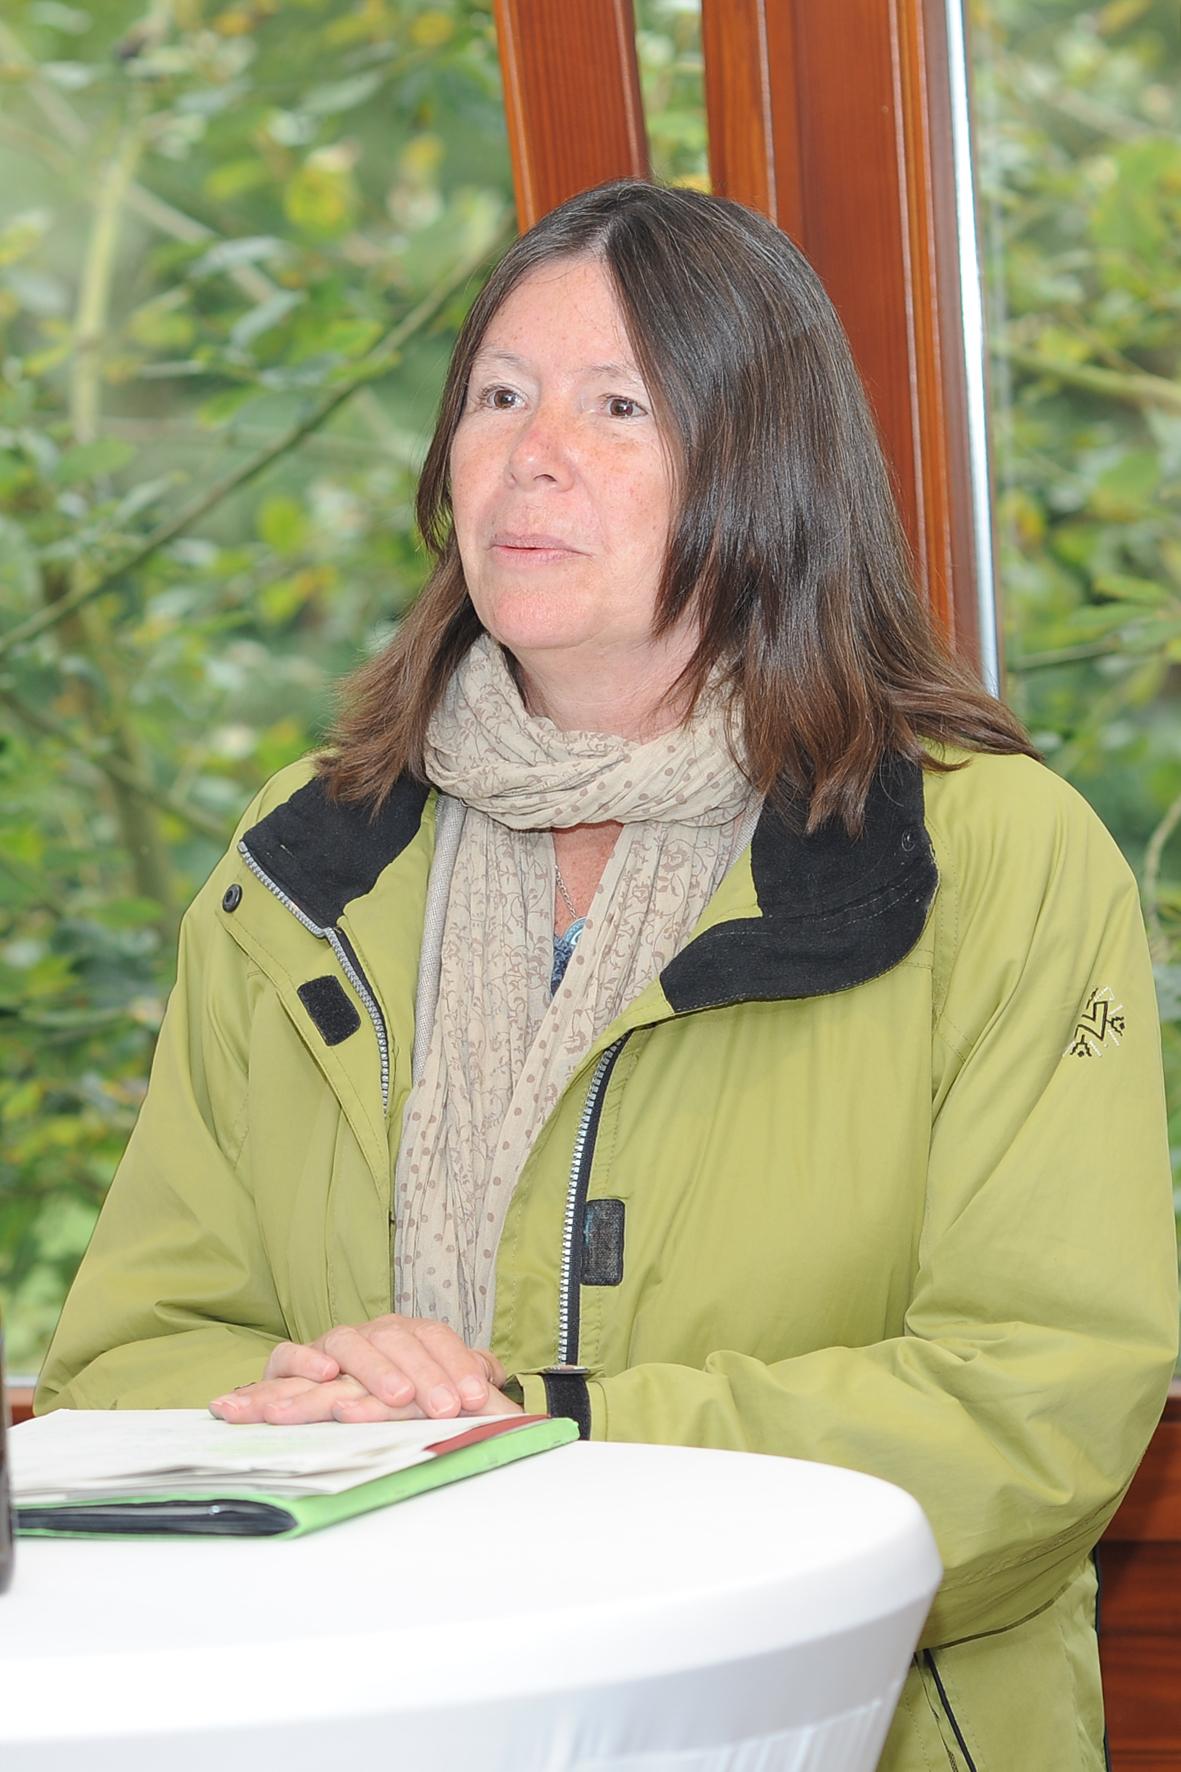 Frau Umweltministerin Hoefken